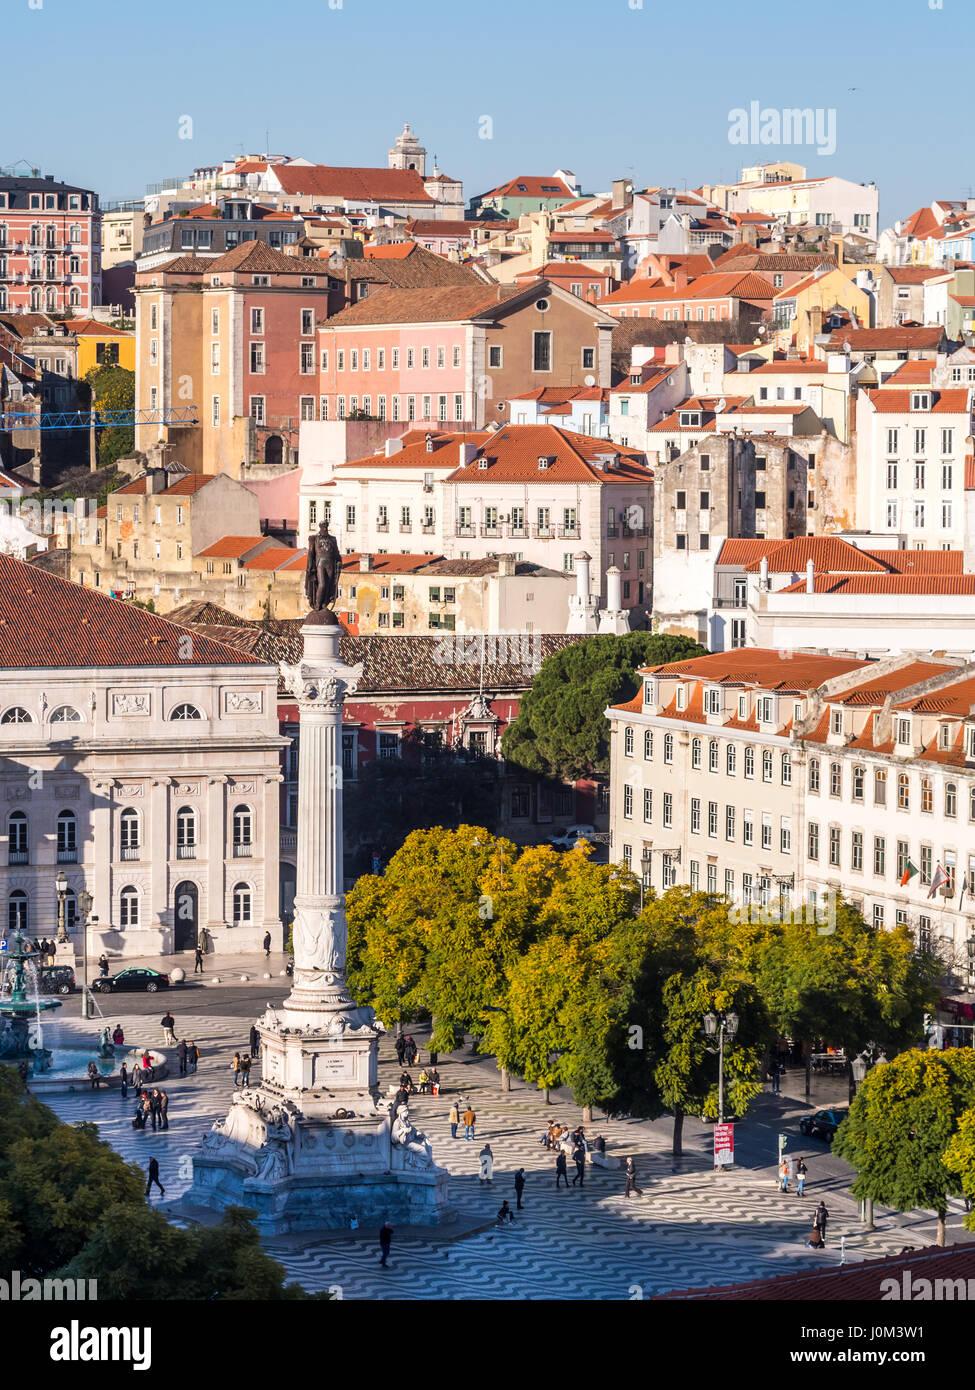 Lisboa, Portugal - 10 de enero de 2017: Columna de Pedro IV en el Rossio Square (Plaza de Pedro IV) en Lisboa Elevador Imagen De Stock